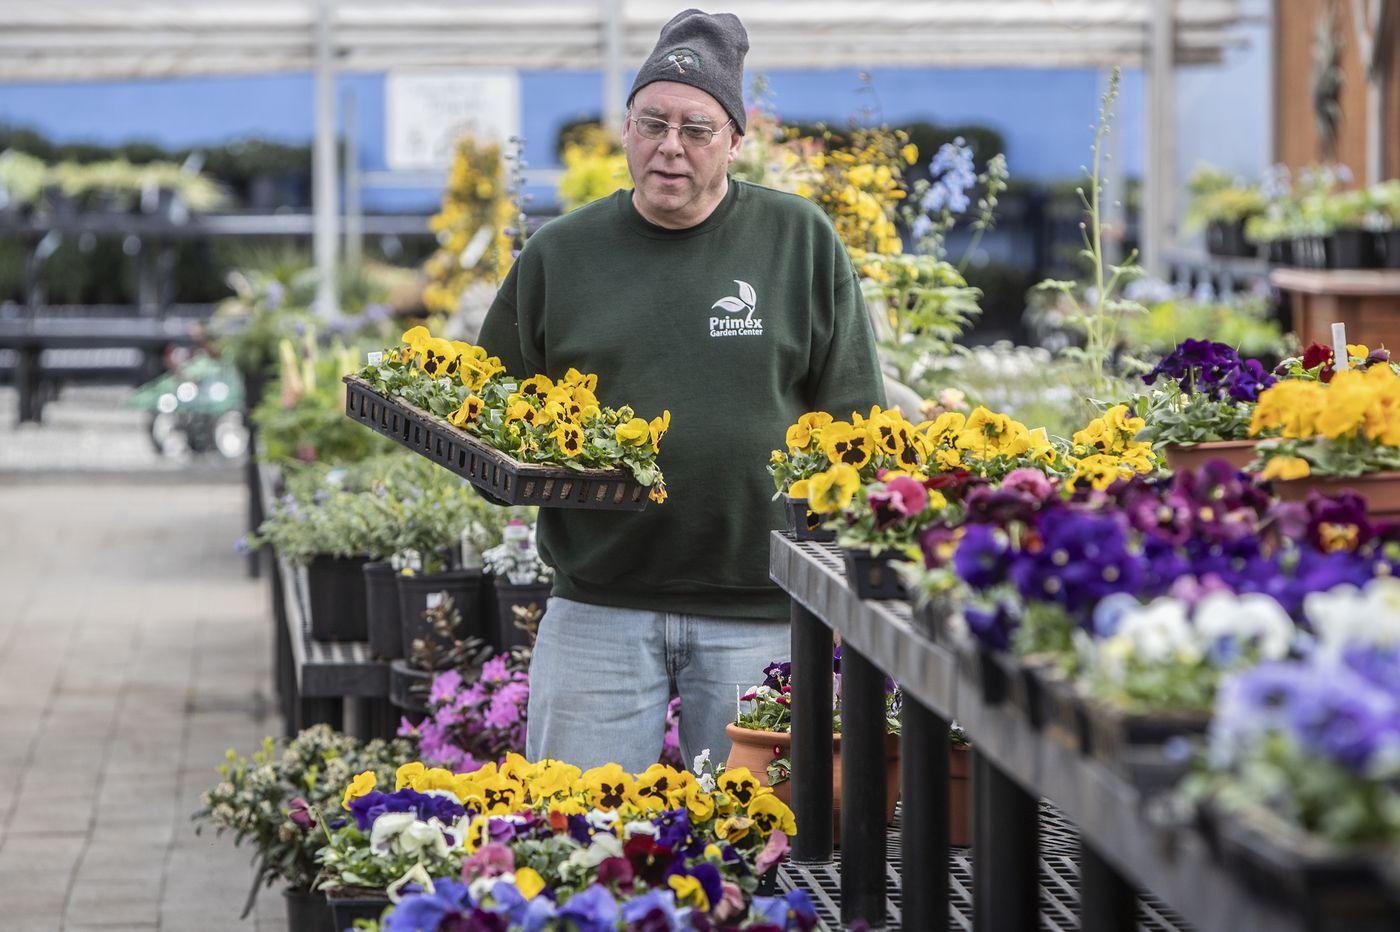 For Many Philly Area Garden Centers The Coronavirus Outbreak